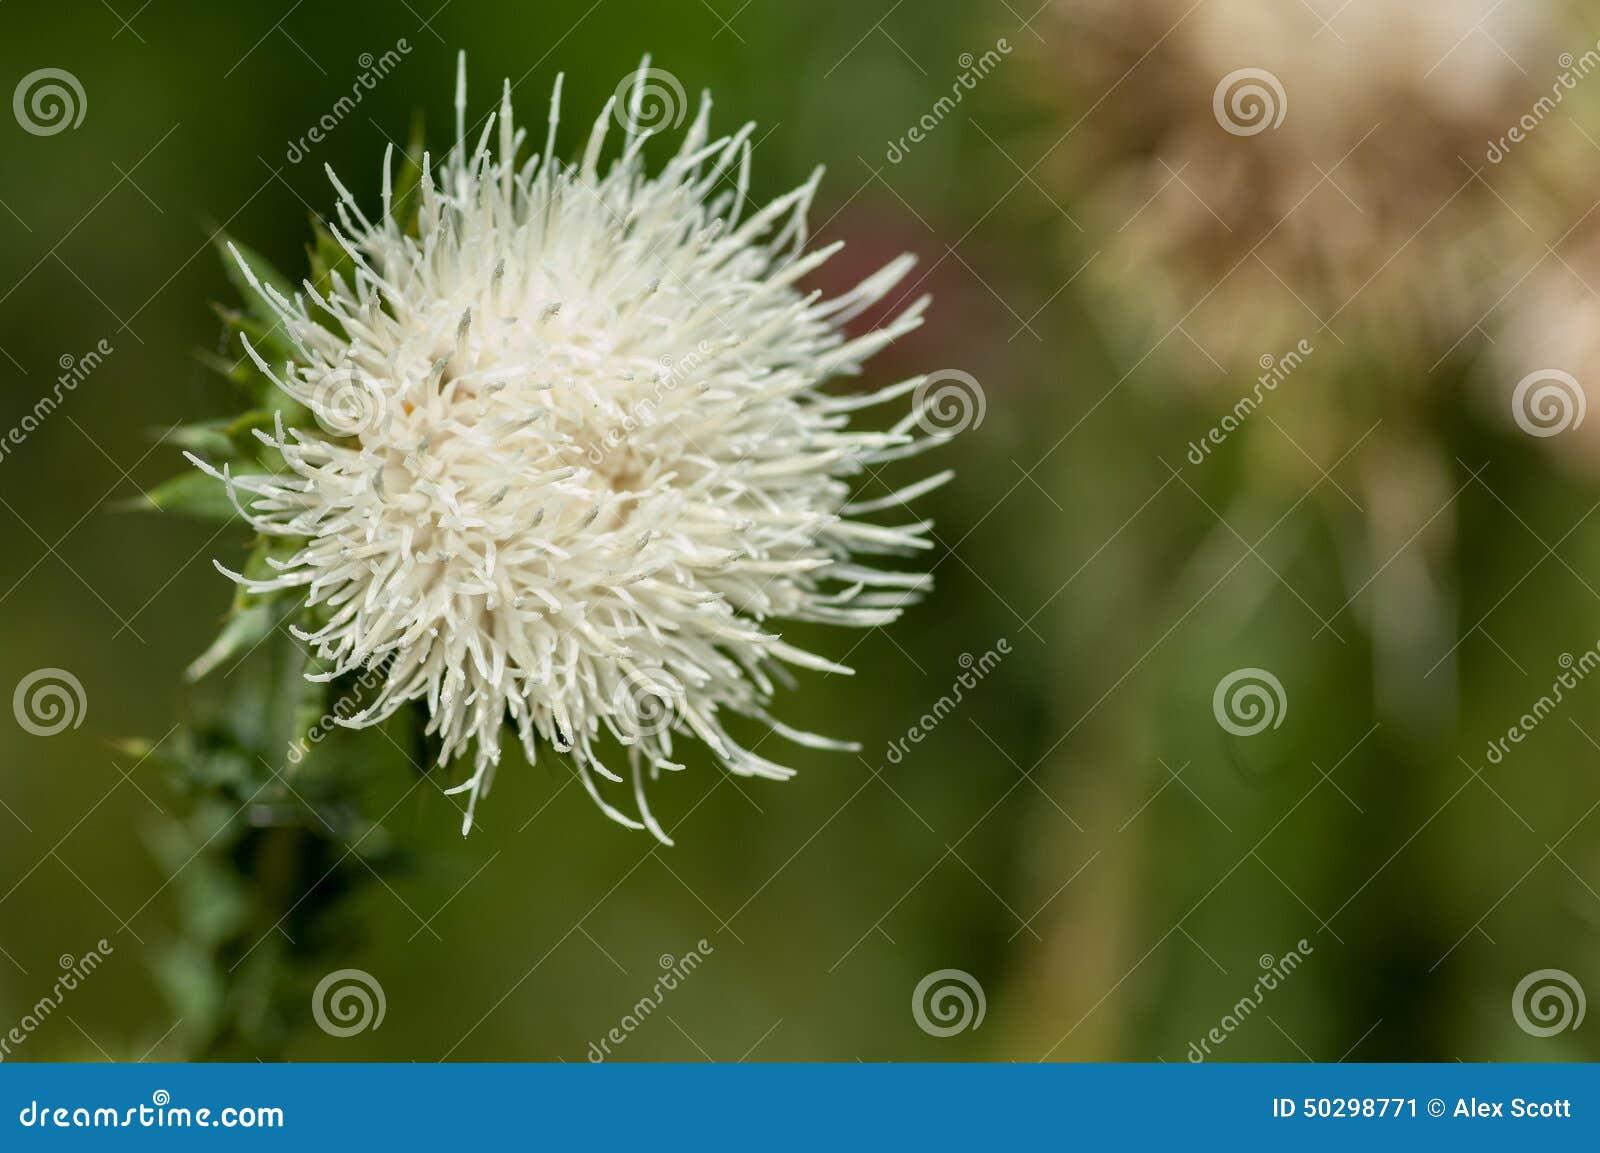 Plant portrait welted thistle stock image image of thistle native plant portrait welted thistle carduus crispus uncommon white flower on grassland mightylinksfo